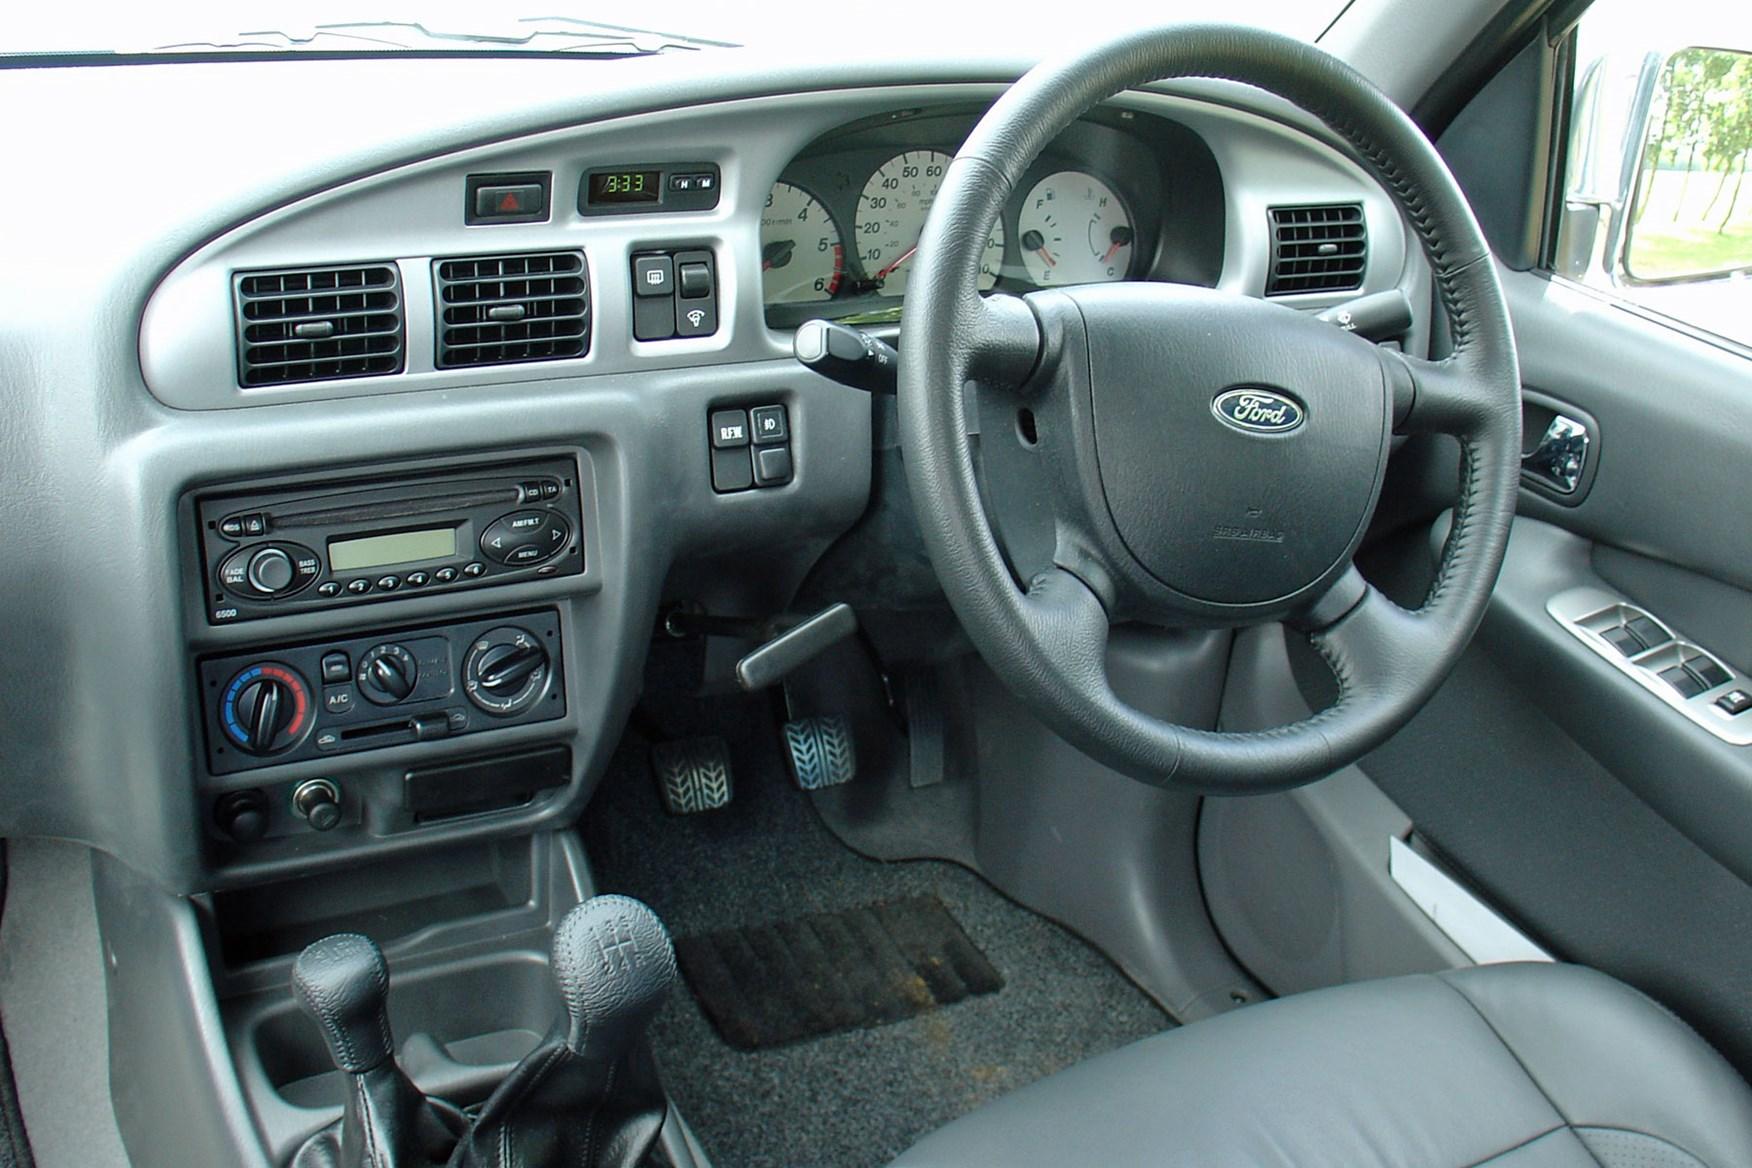 Ford Ranger (1999-2006) cab interior